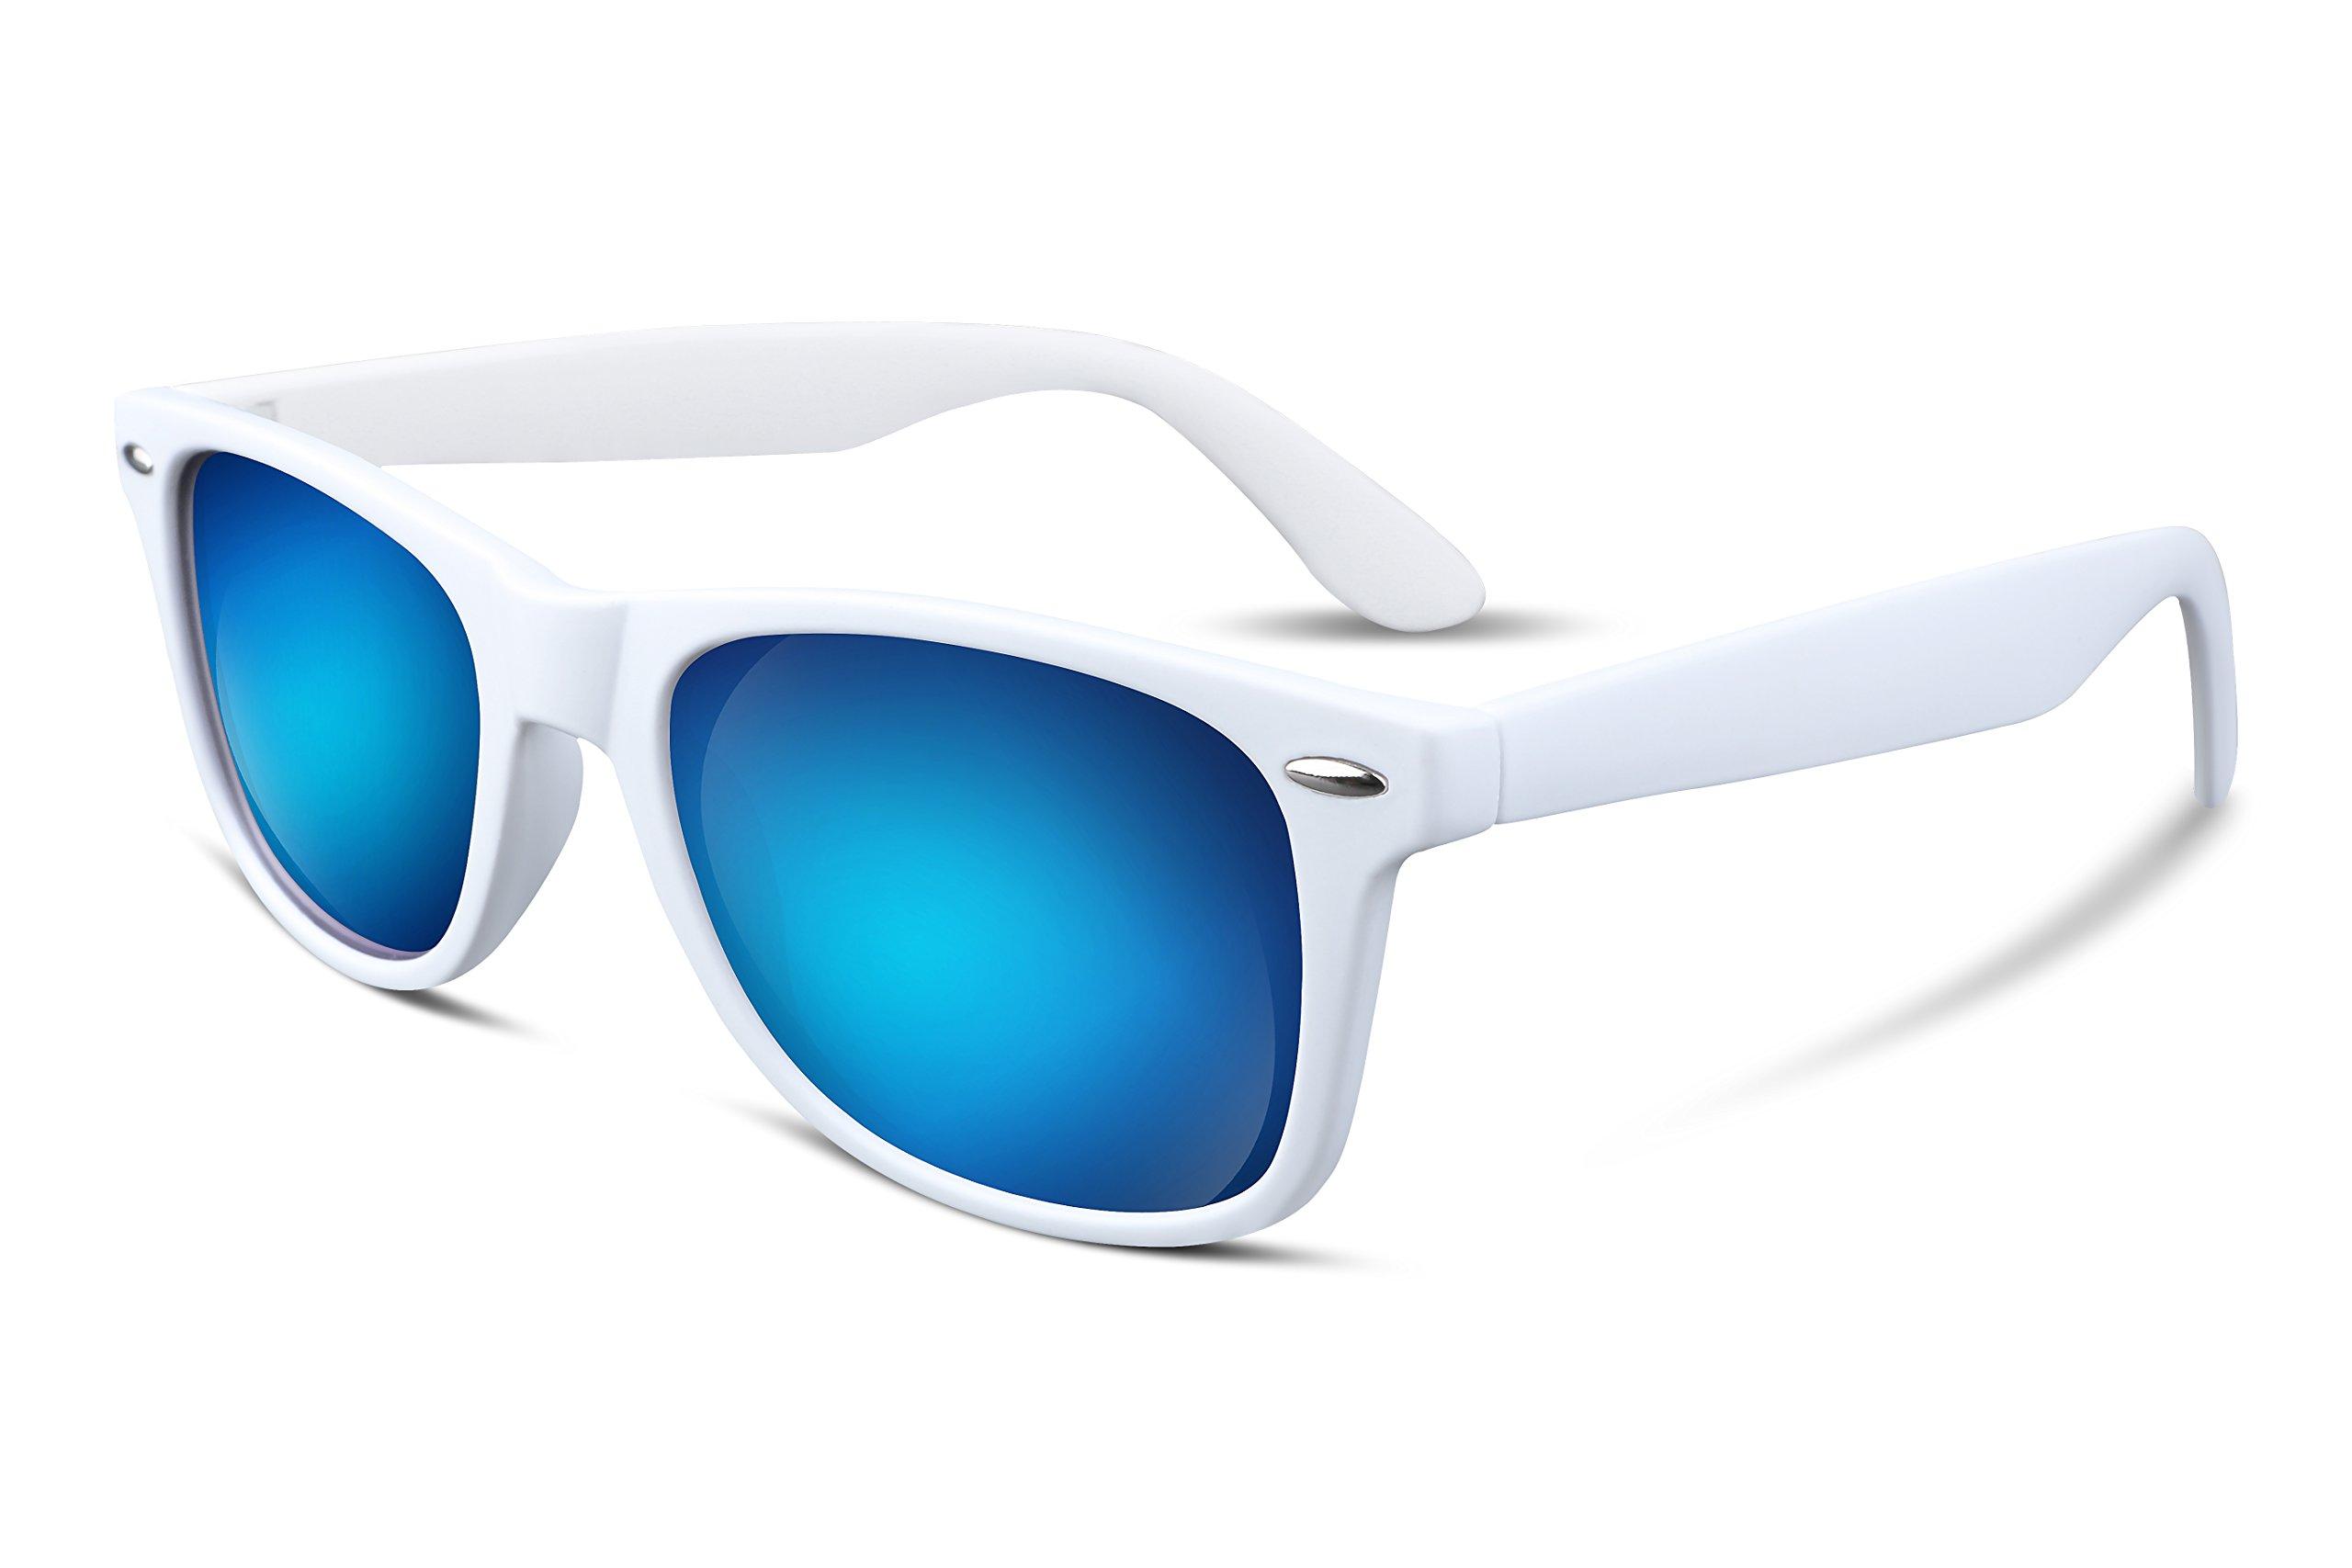 FEISEDY Great Classic Polarized Sunglasses Men Women Mirrored HD Lens White-Blue B1858